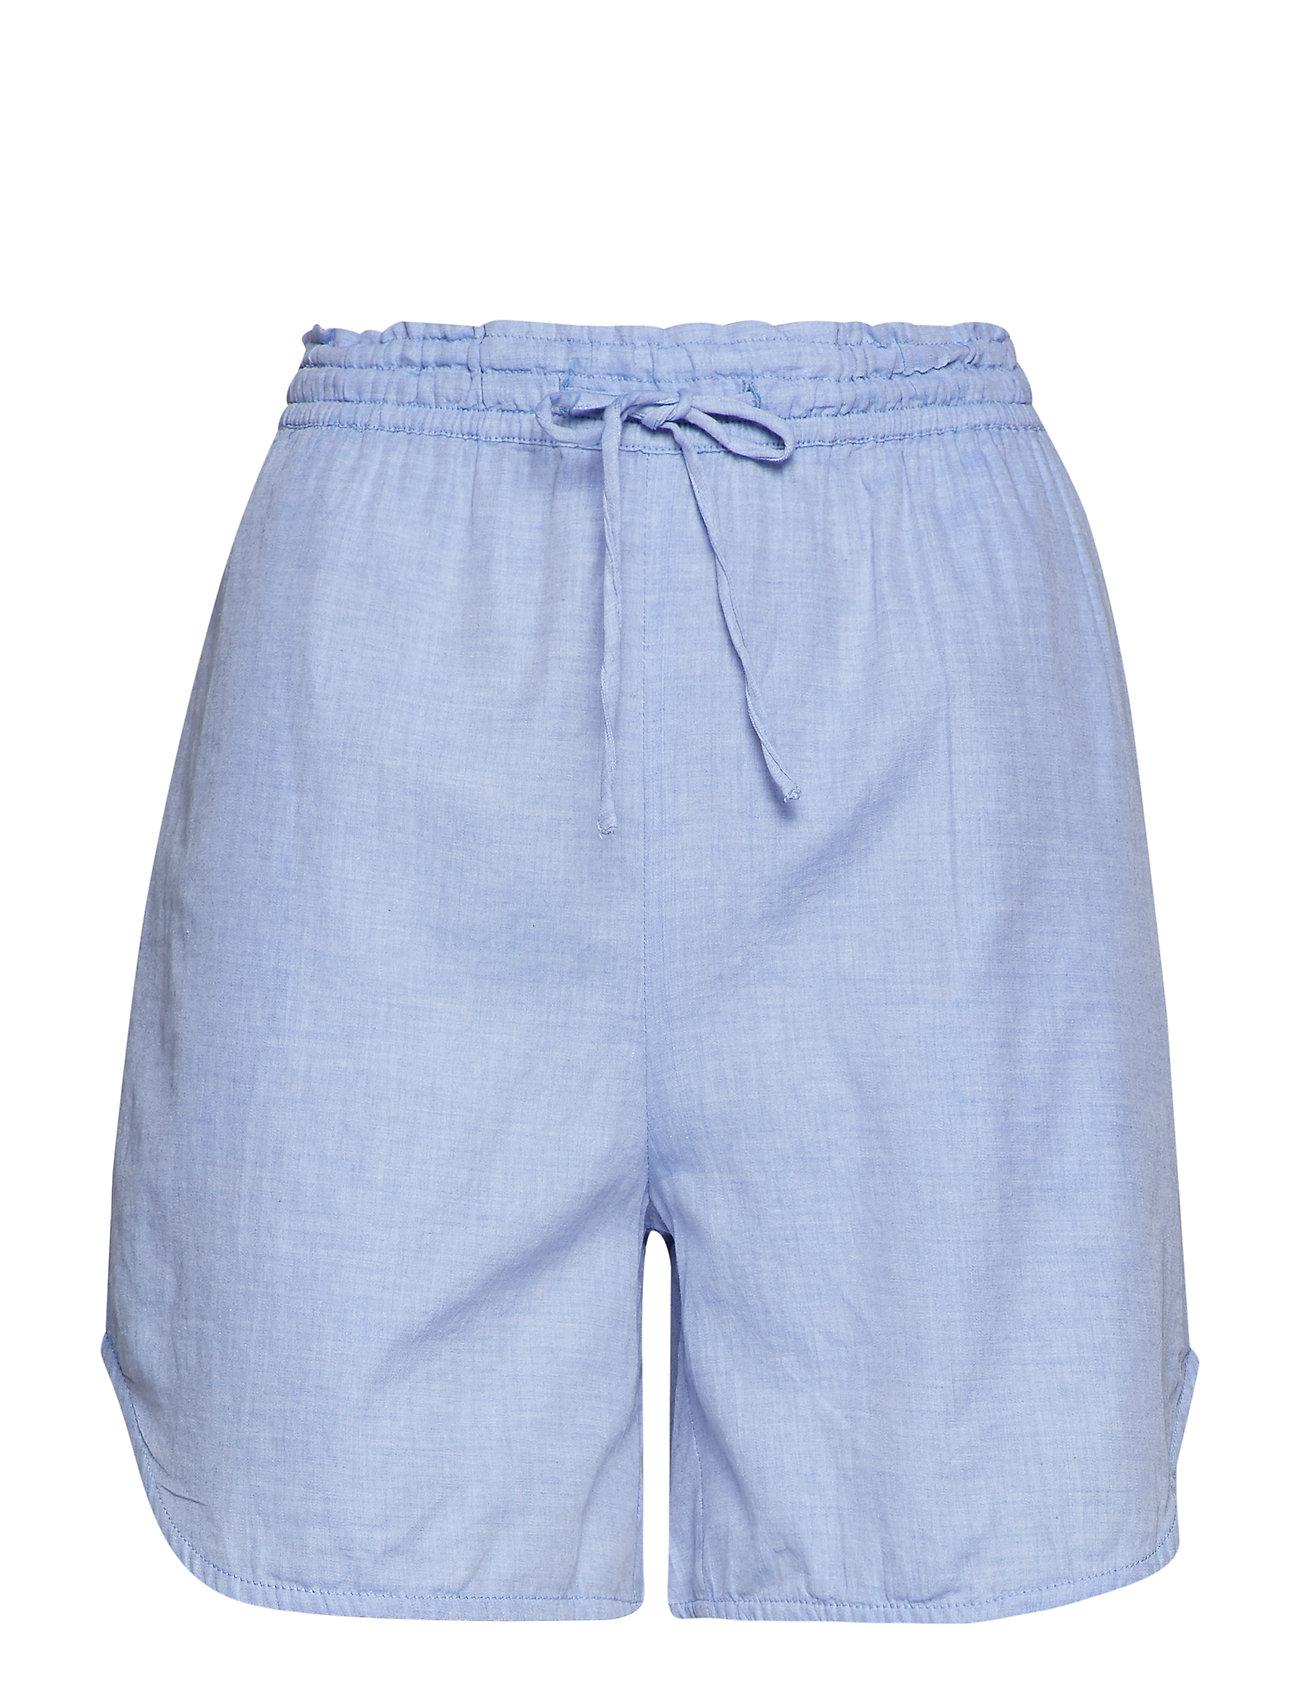 Moshi Moshi Mind beam shorts chambray - LIGHT BLUE CHAMBRAY